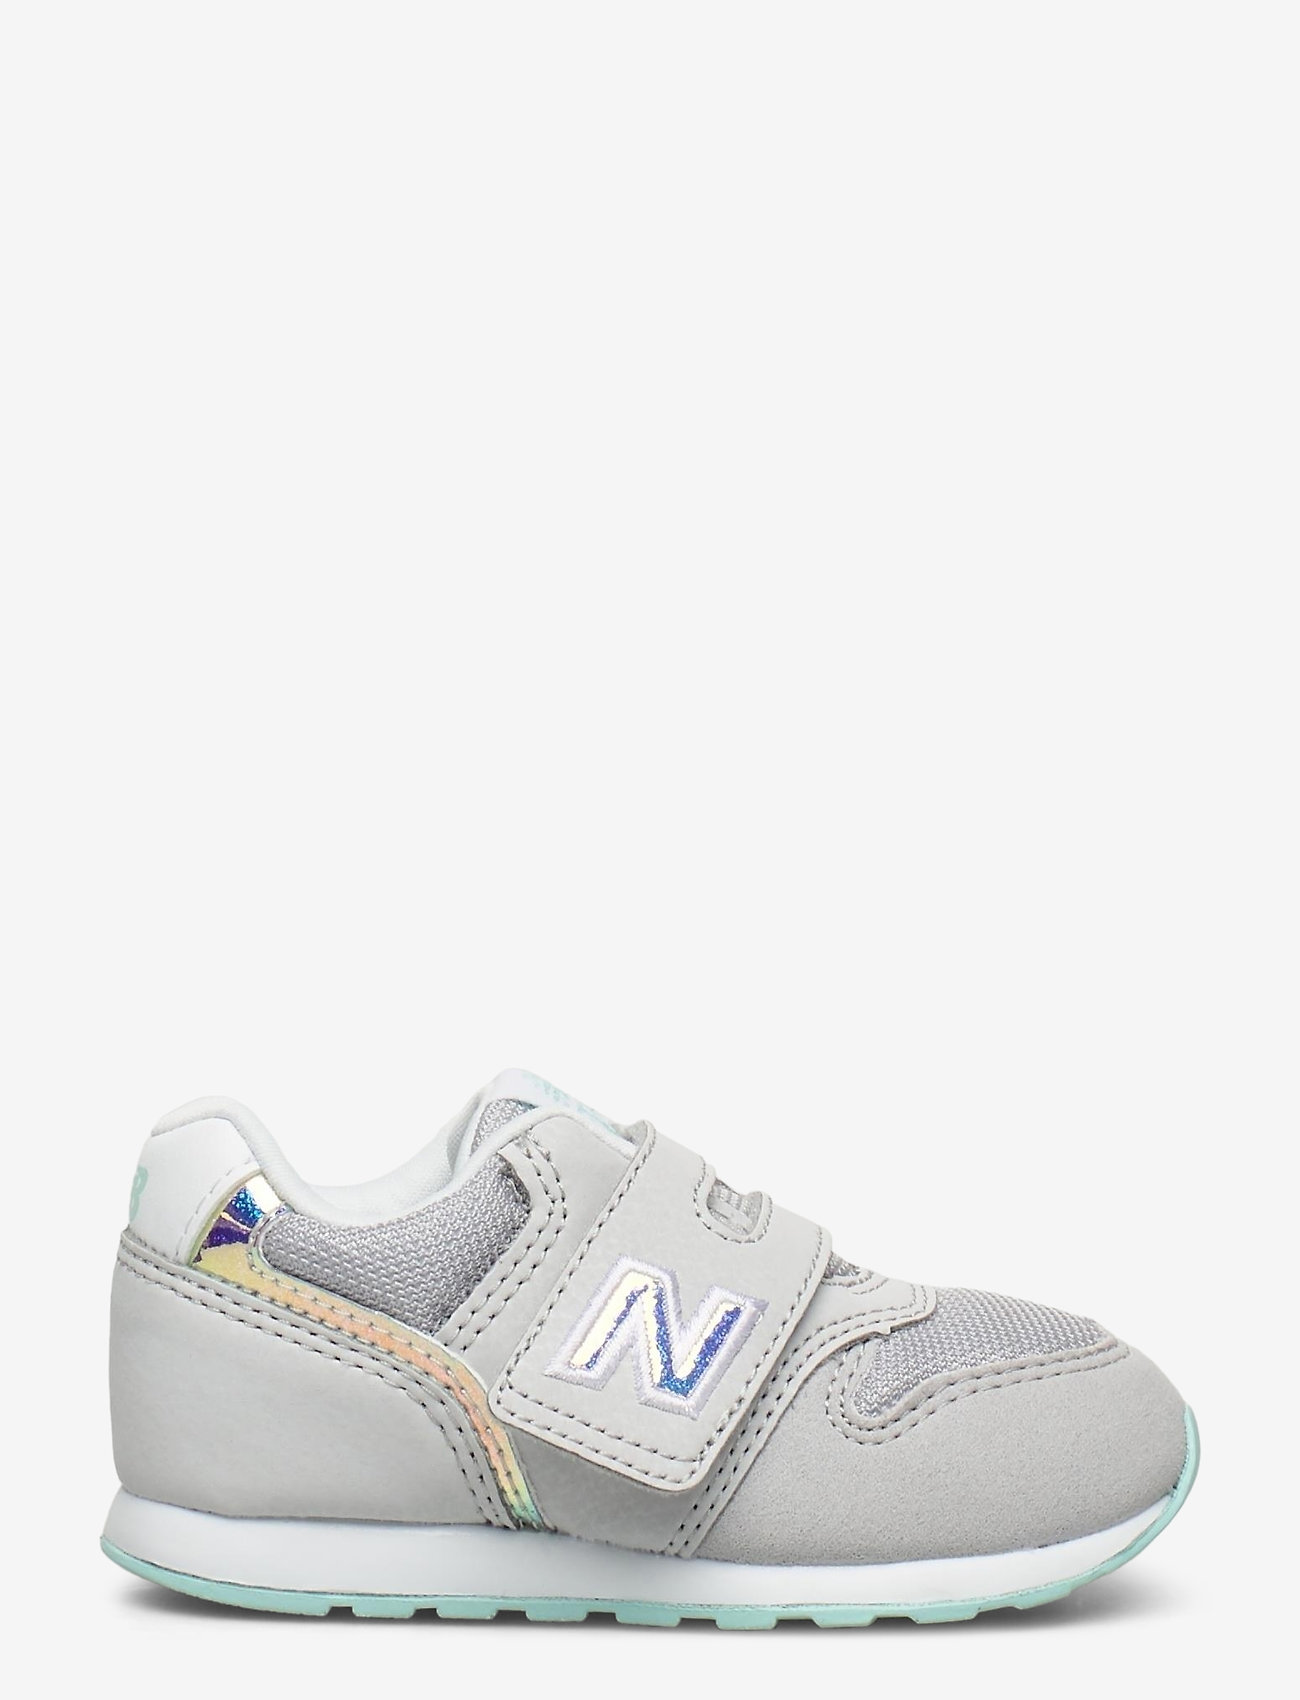 New Balance - IZ996HGY - baskets basses - grey - 1